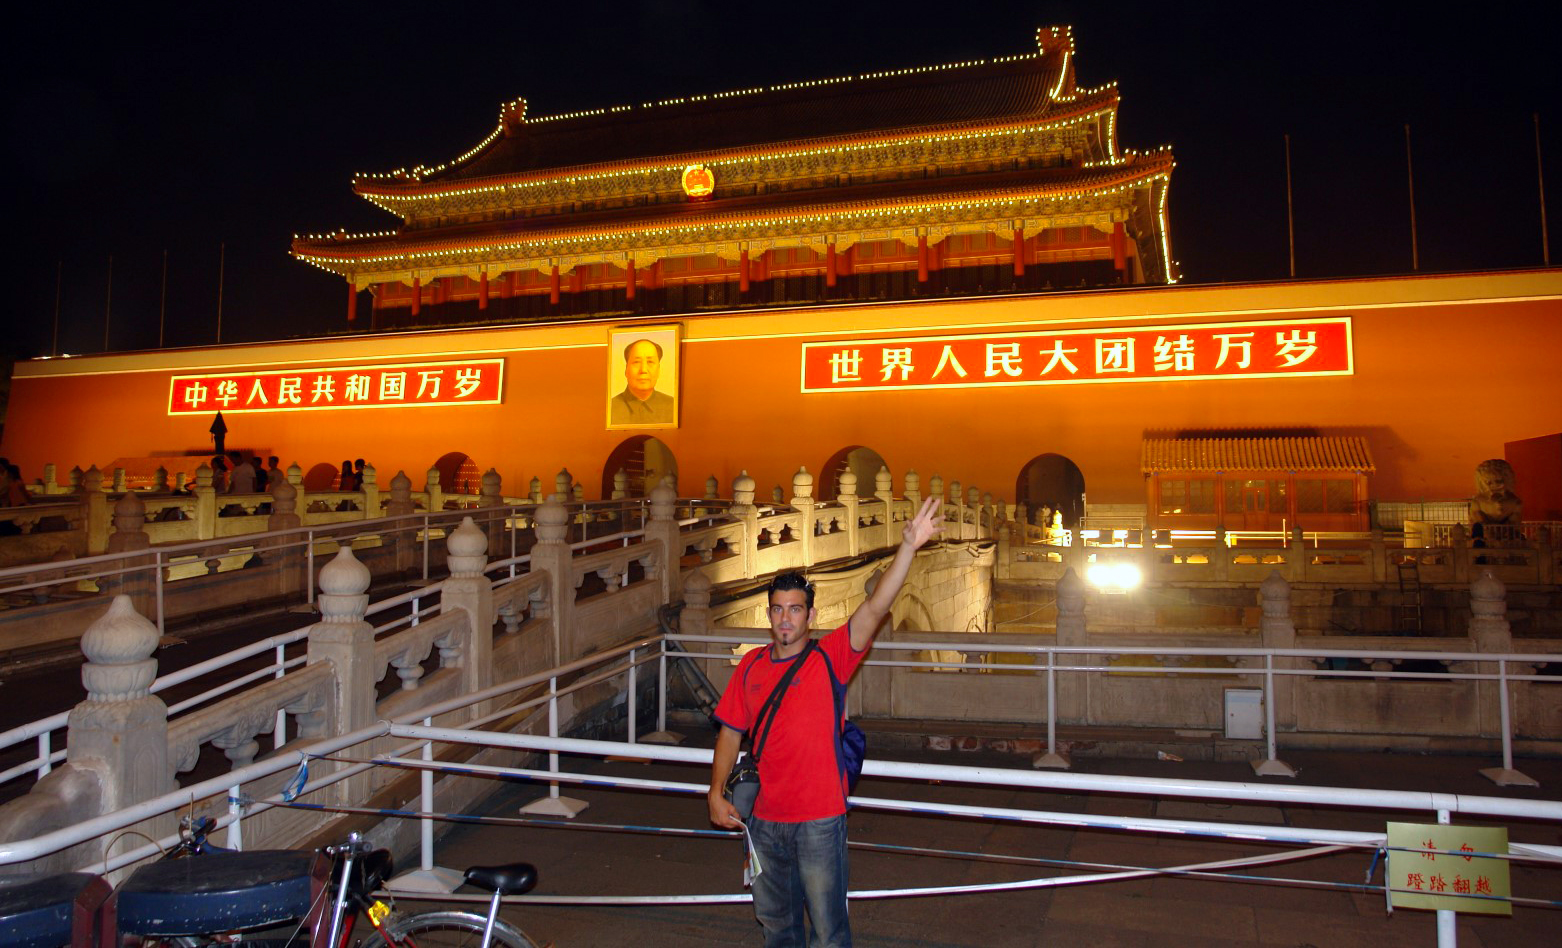 Qué ver en Pekín, China: Plaza de Tian'anmen en Pekin / Beijing - China